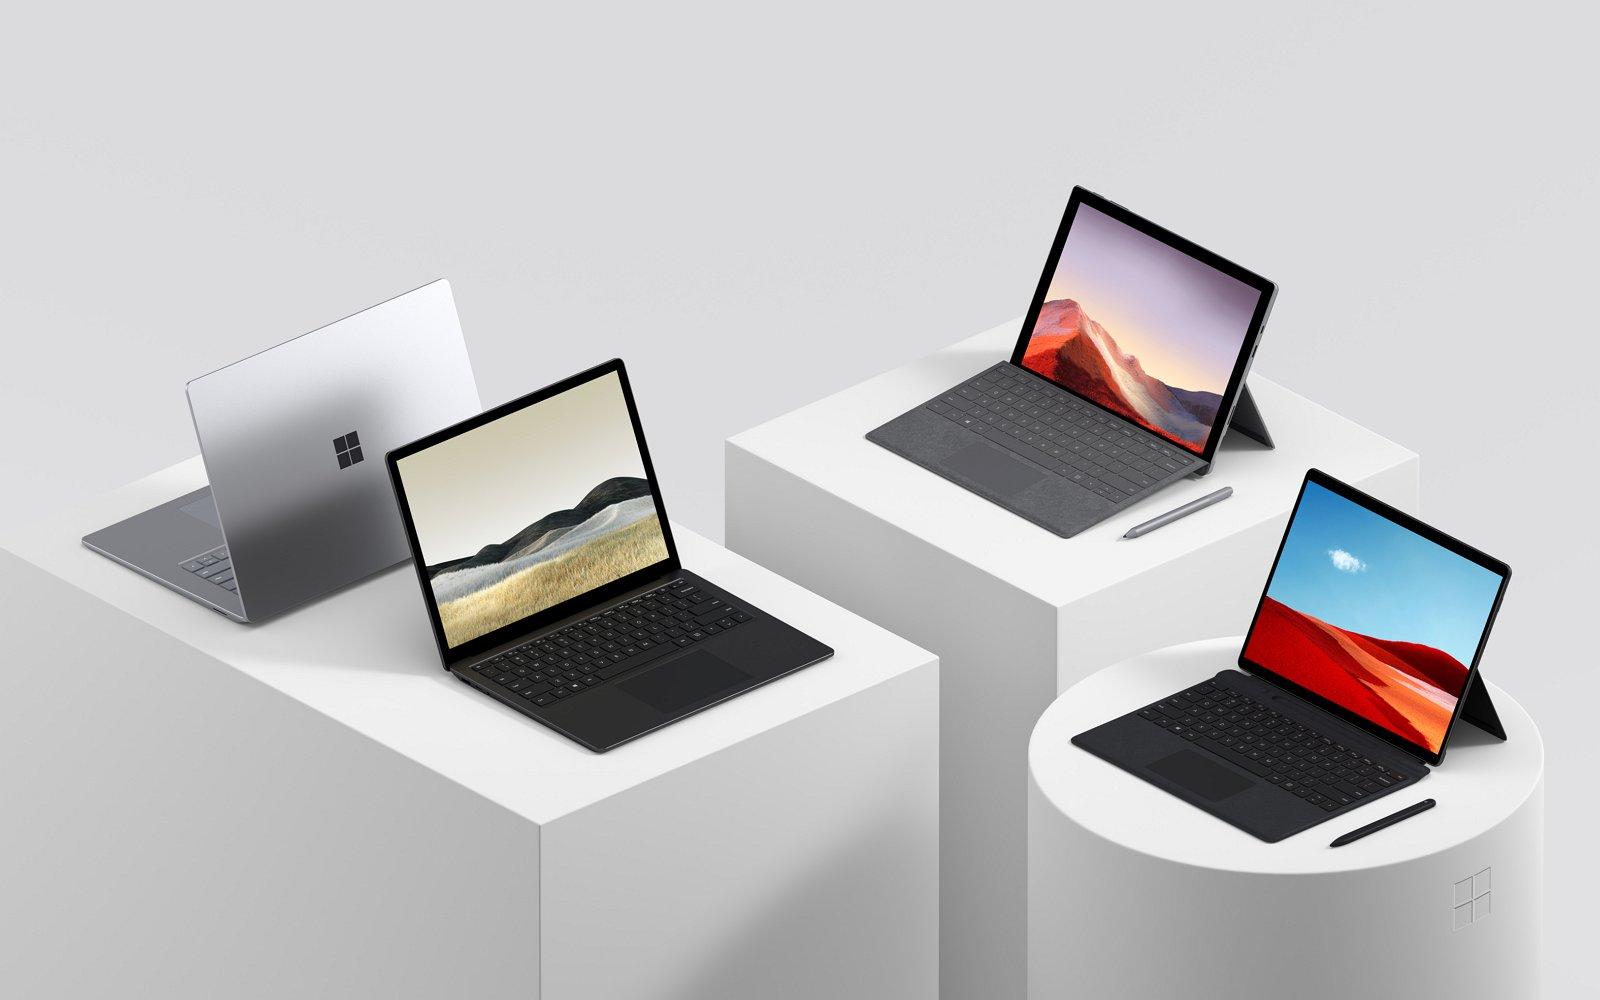 Surface 2019 group (image source Microsoft)